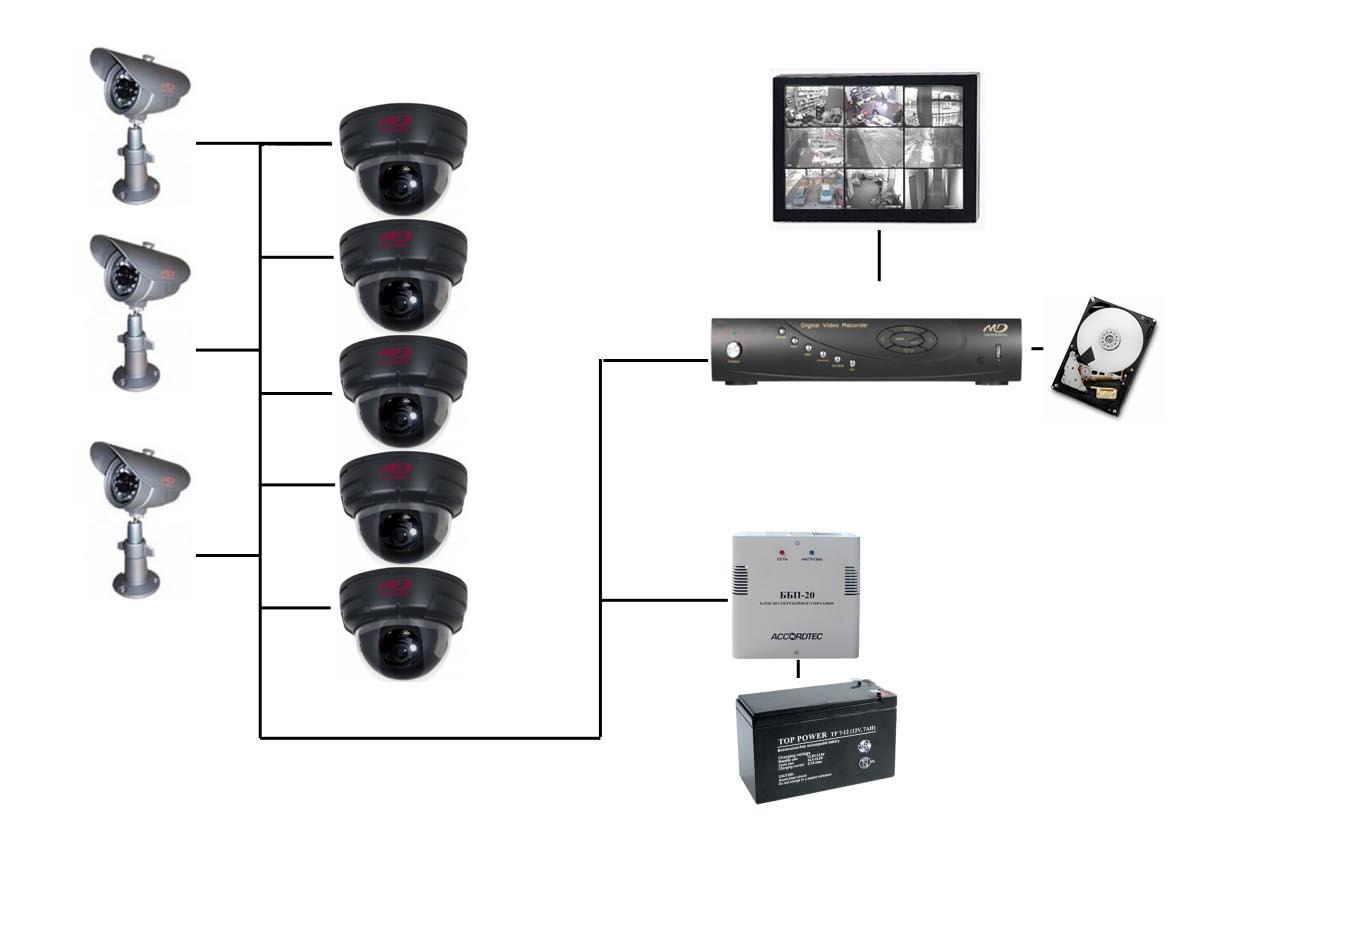 microdigital videosystem